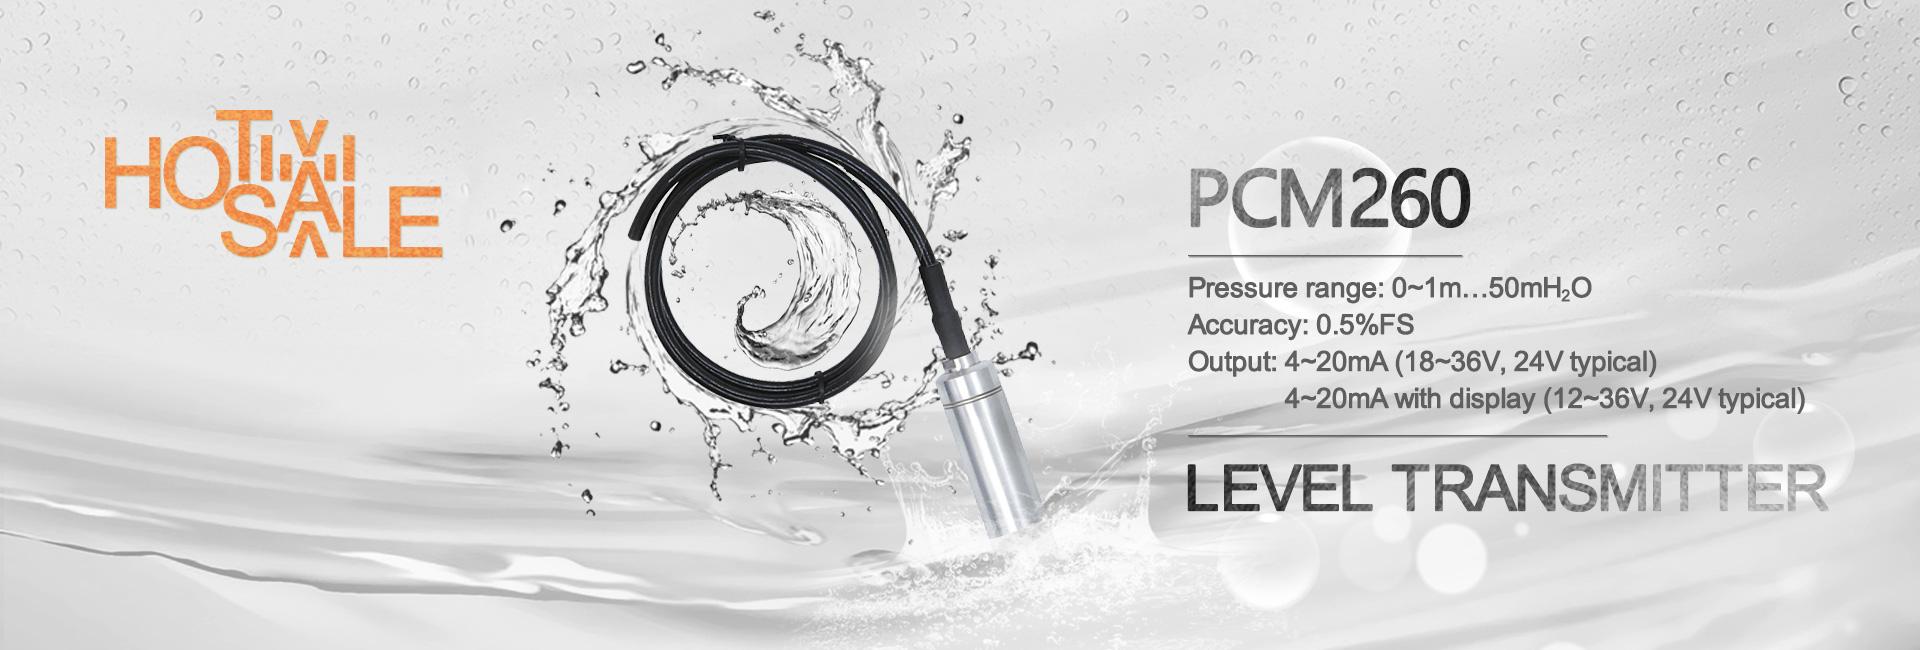 PCM260 Pressure/Level Transmitter